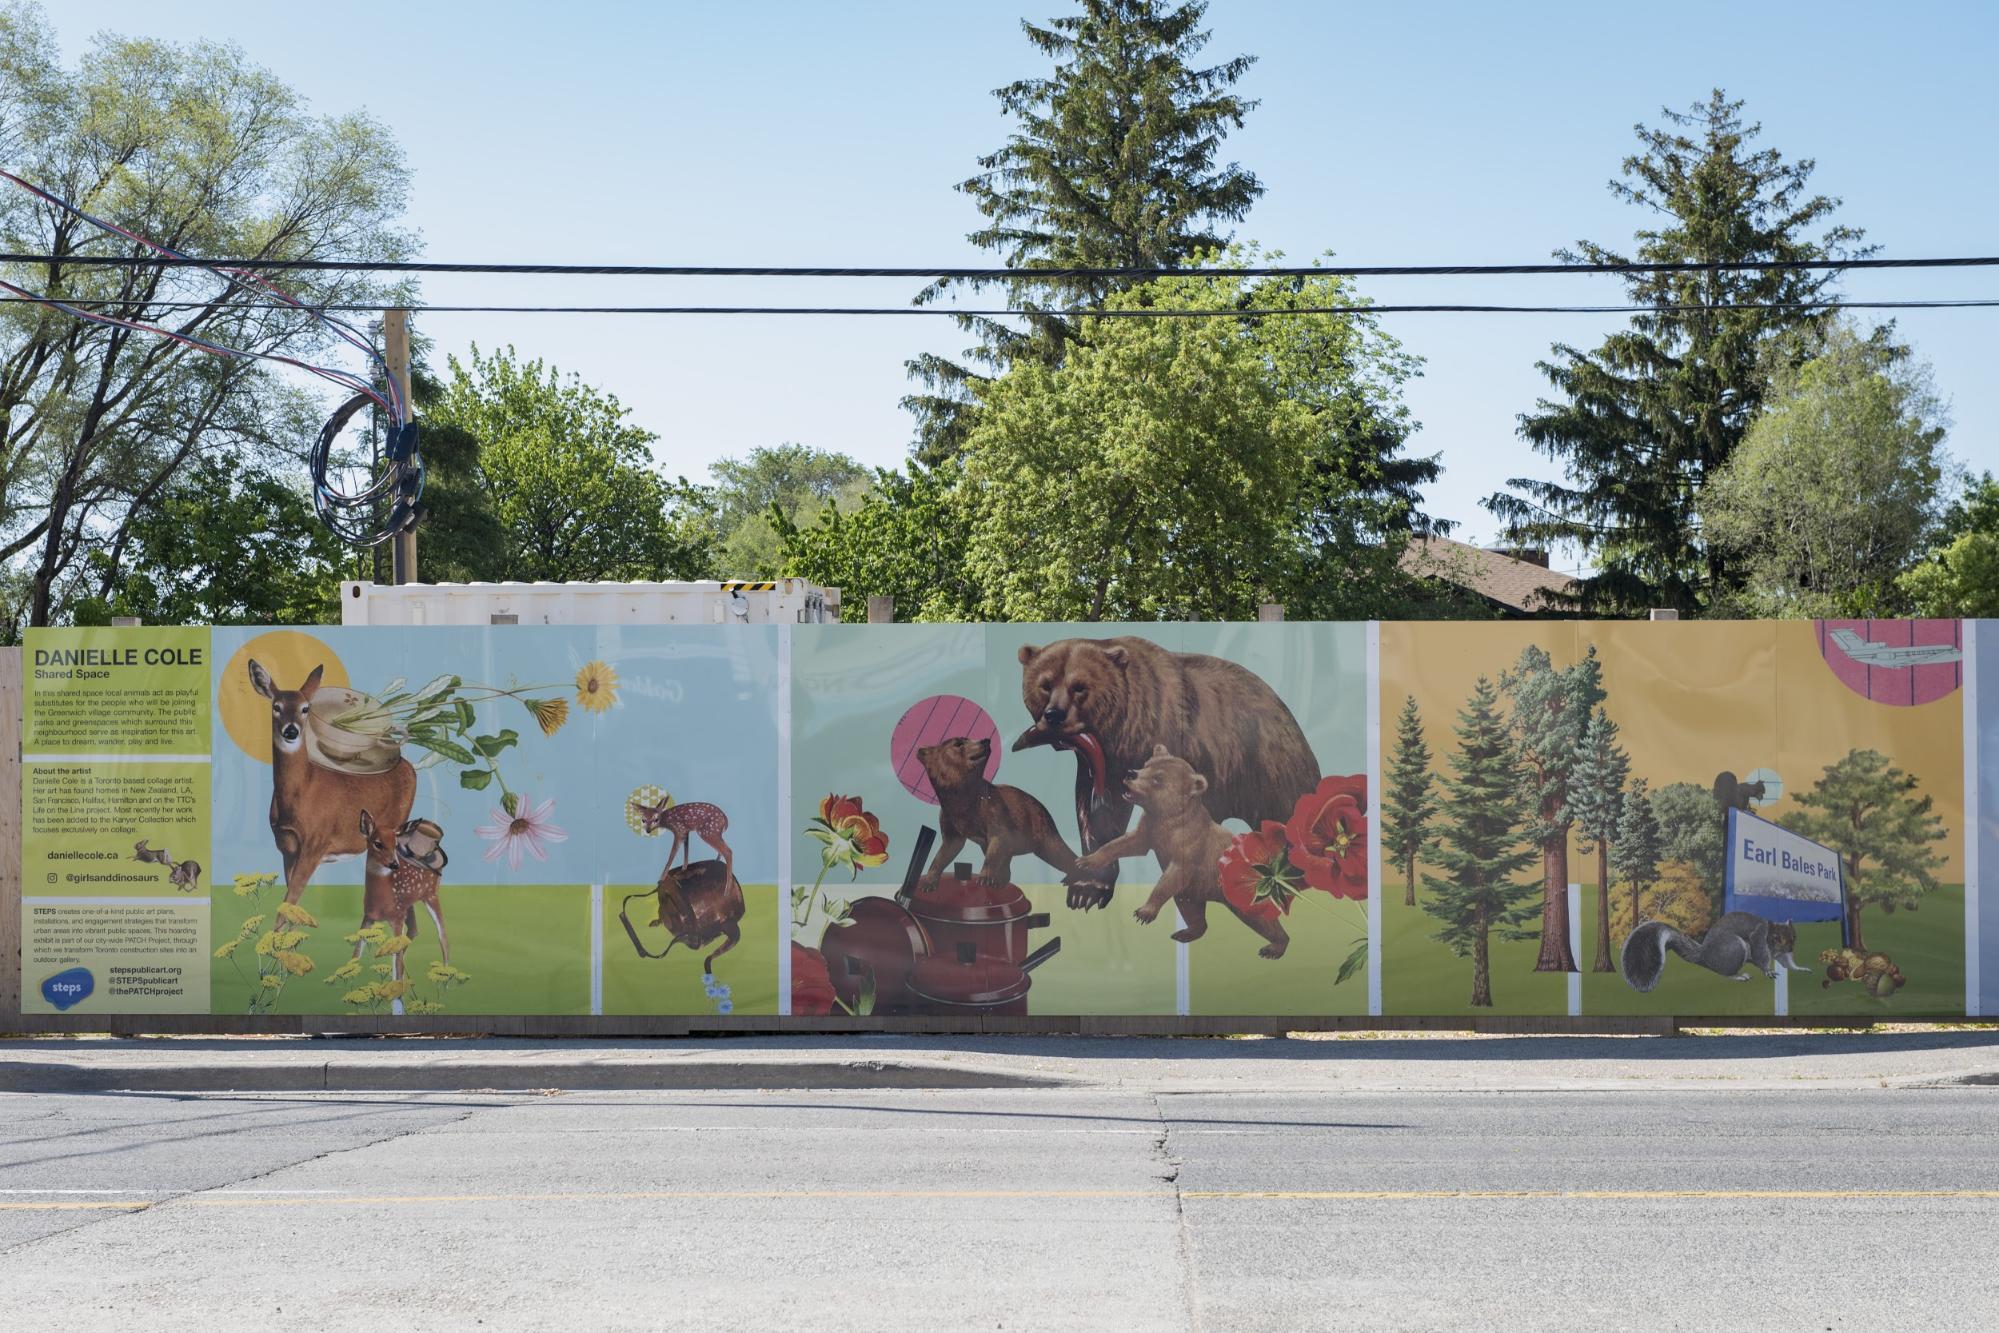 Danielle Cole's artwork of wildlife on construction hoardings